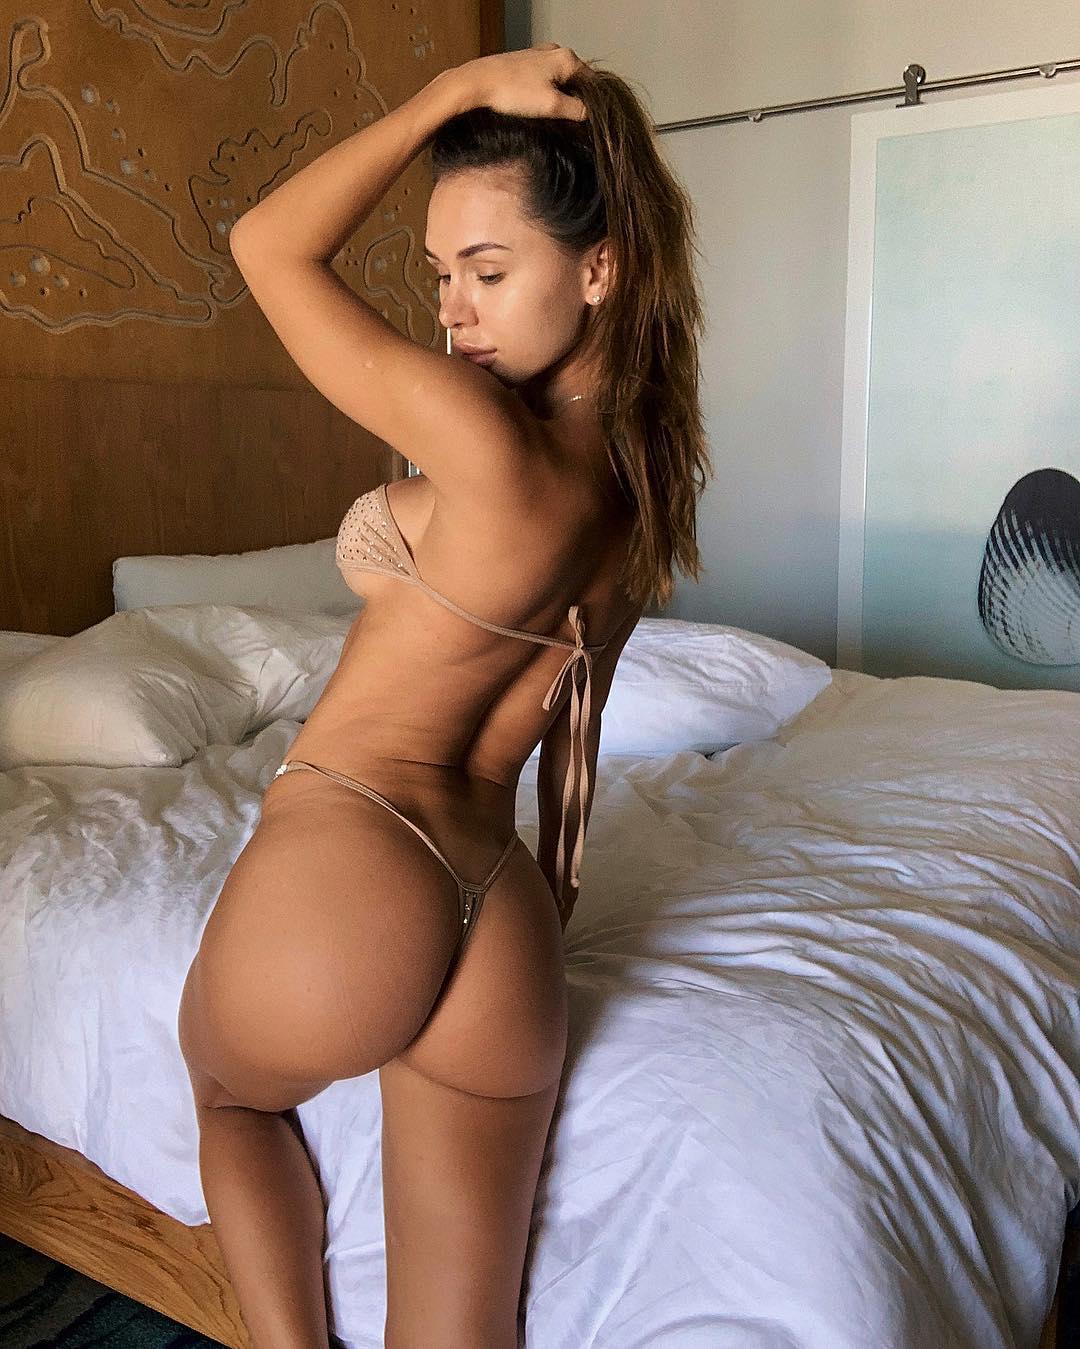 Jenny M Hanna Nude jenny hanna porn pic - eporner